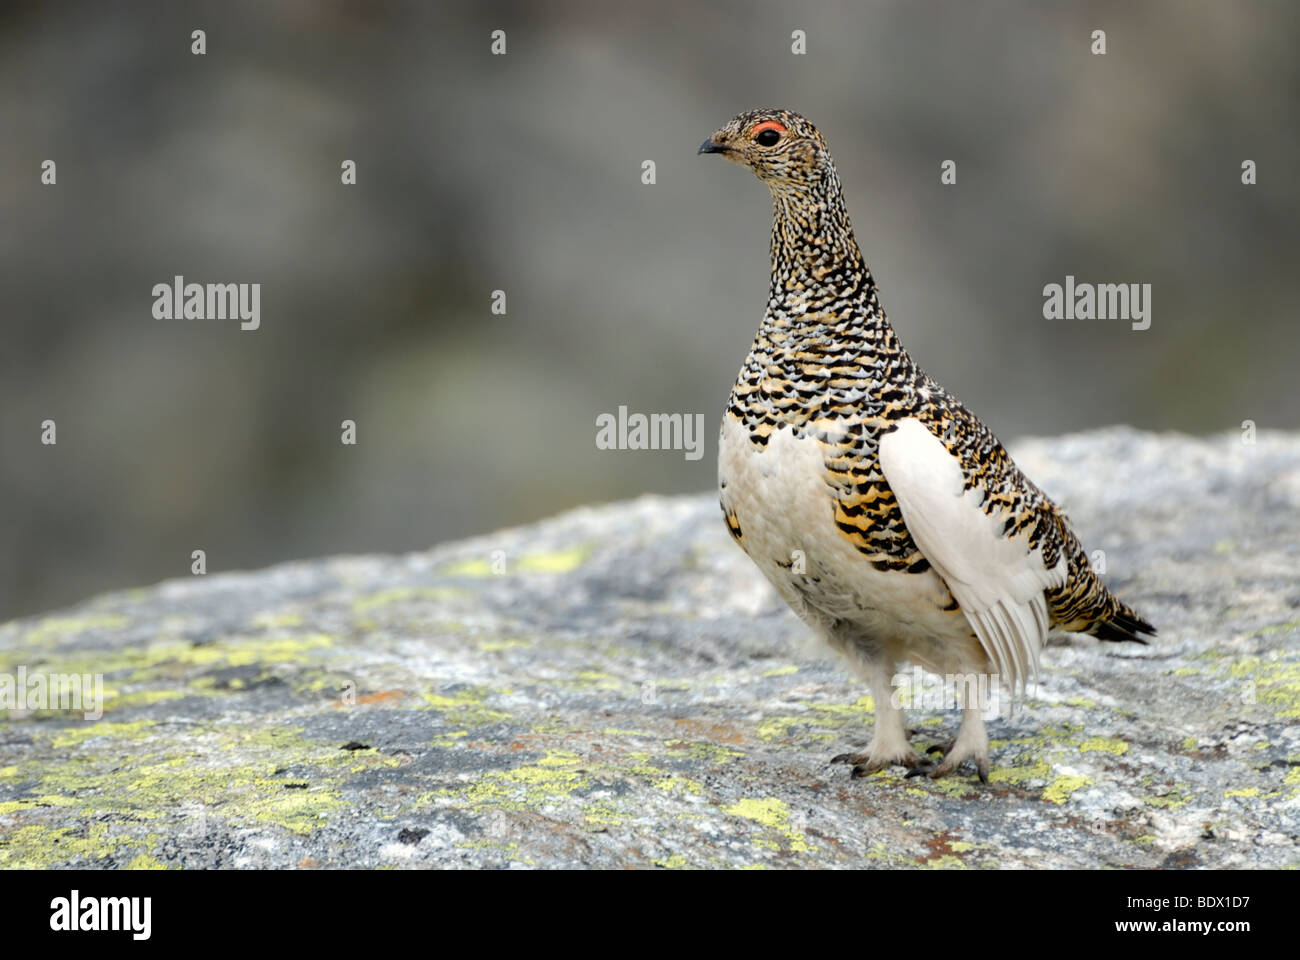 Female Ptarmigan (Lagopus muta) in the summer plumage, Folgefonna National Park, Hardanger region, Norway, Europe Stock Photo